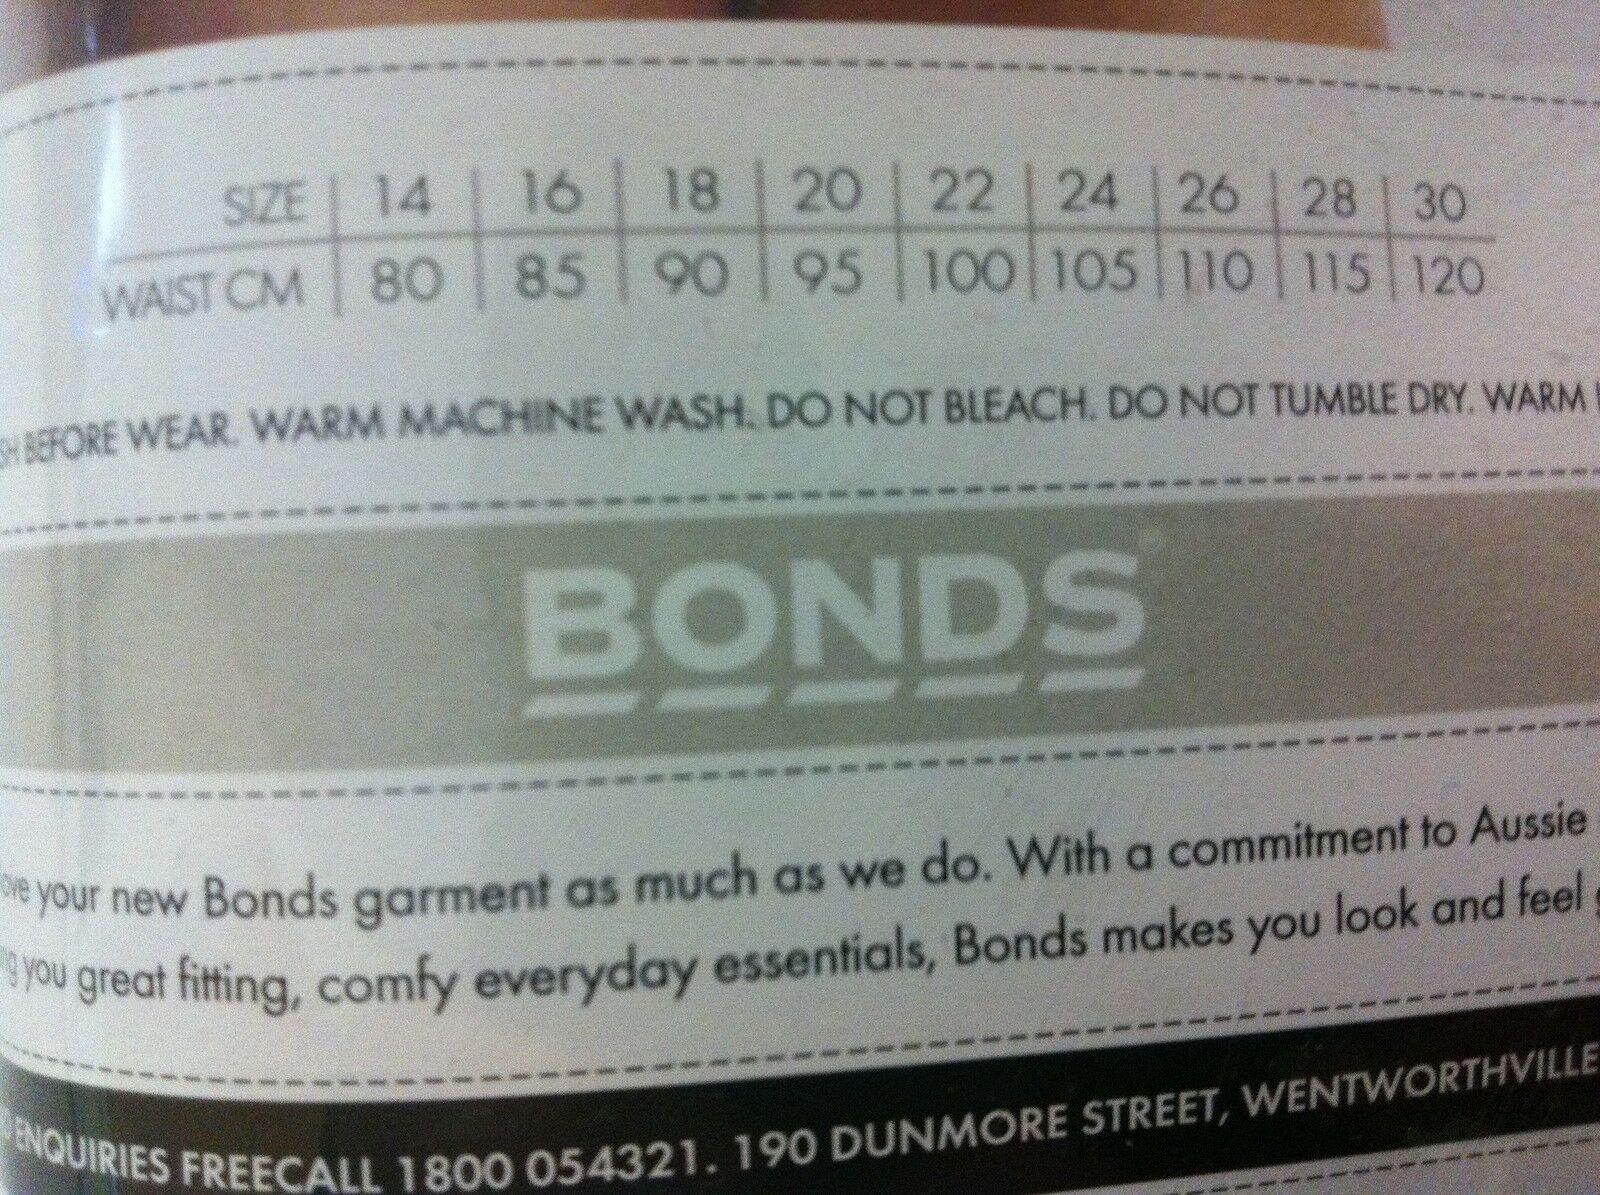 5-6-10-20-x-MENS-BONDS-UNDERWEAR-Guyfront-Trunks-Briefs-Boxer-Shorts-S-XXL thumbnail 18